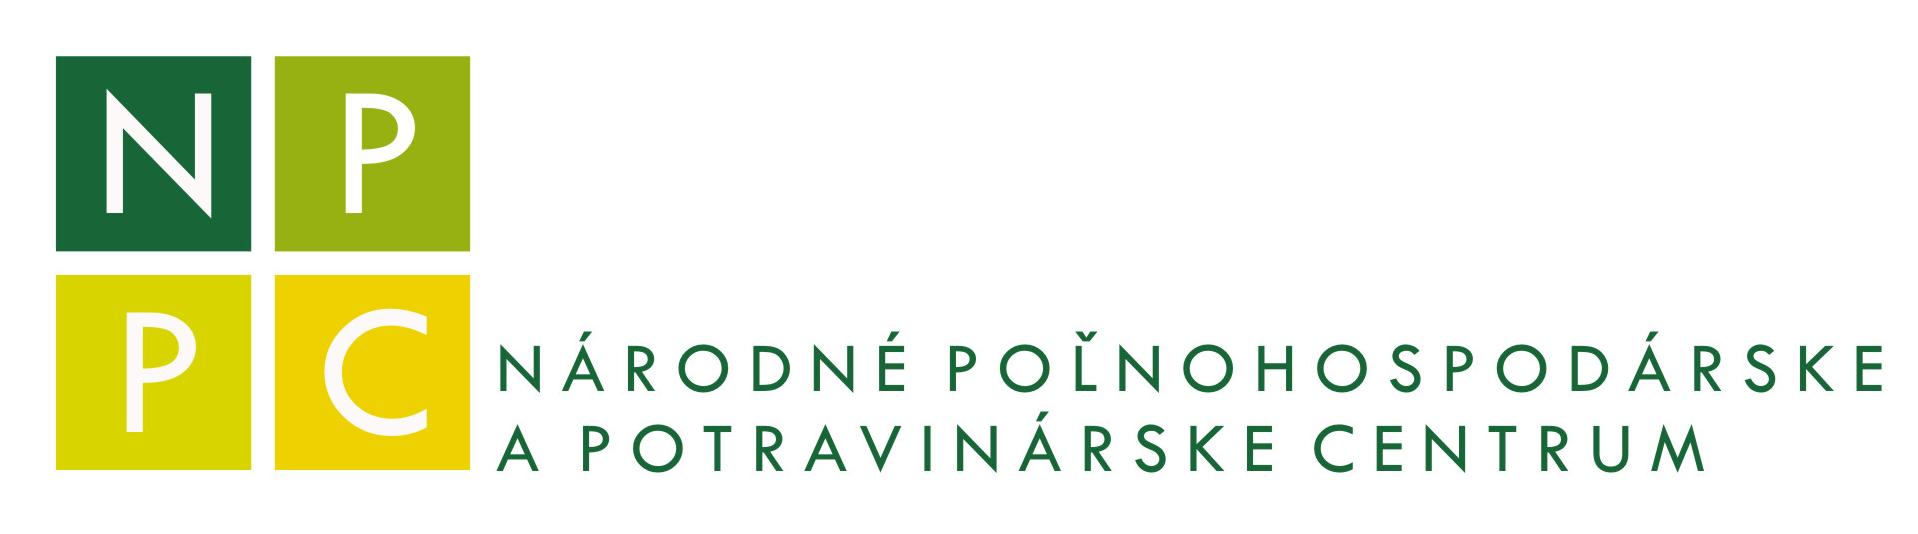 Národné poľnohospodárske a potravinárske centrum Lužianky